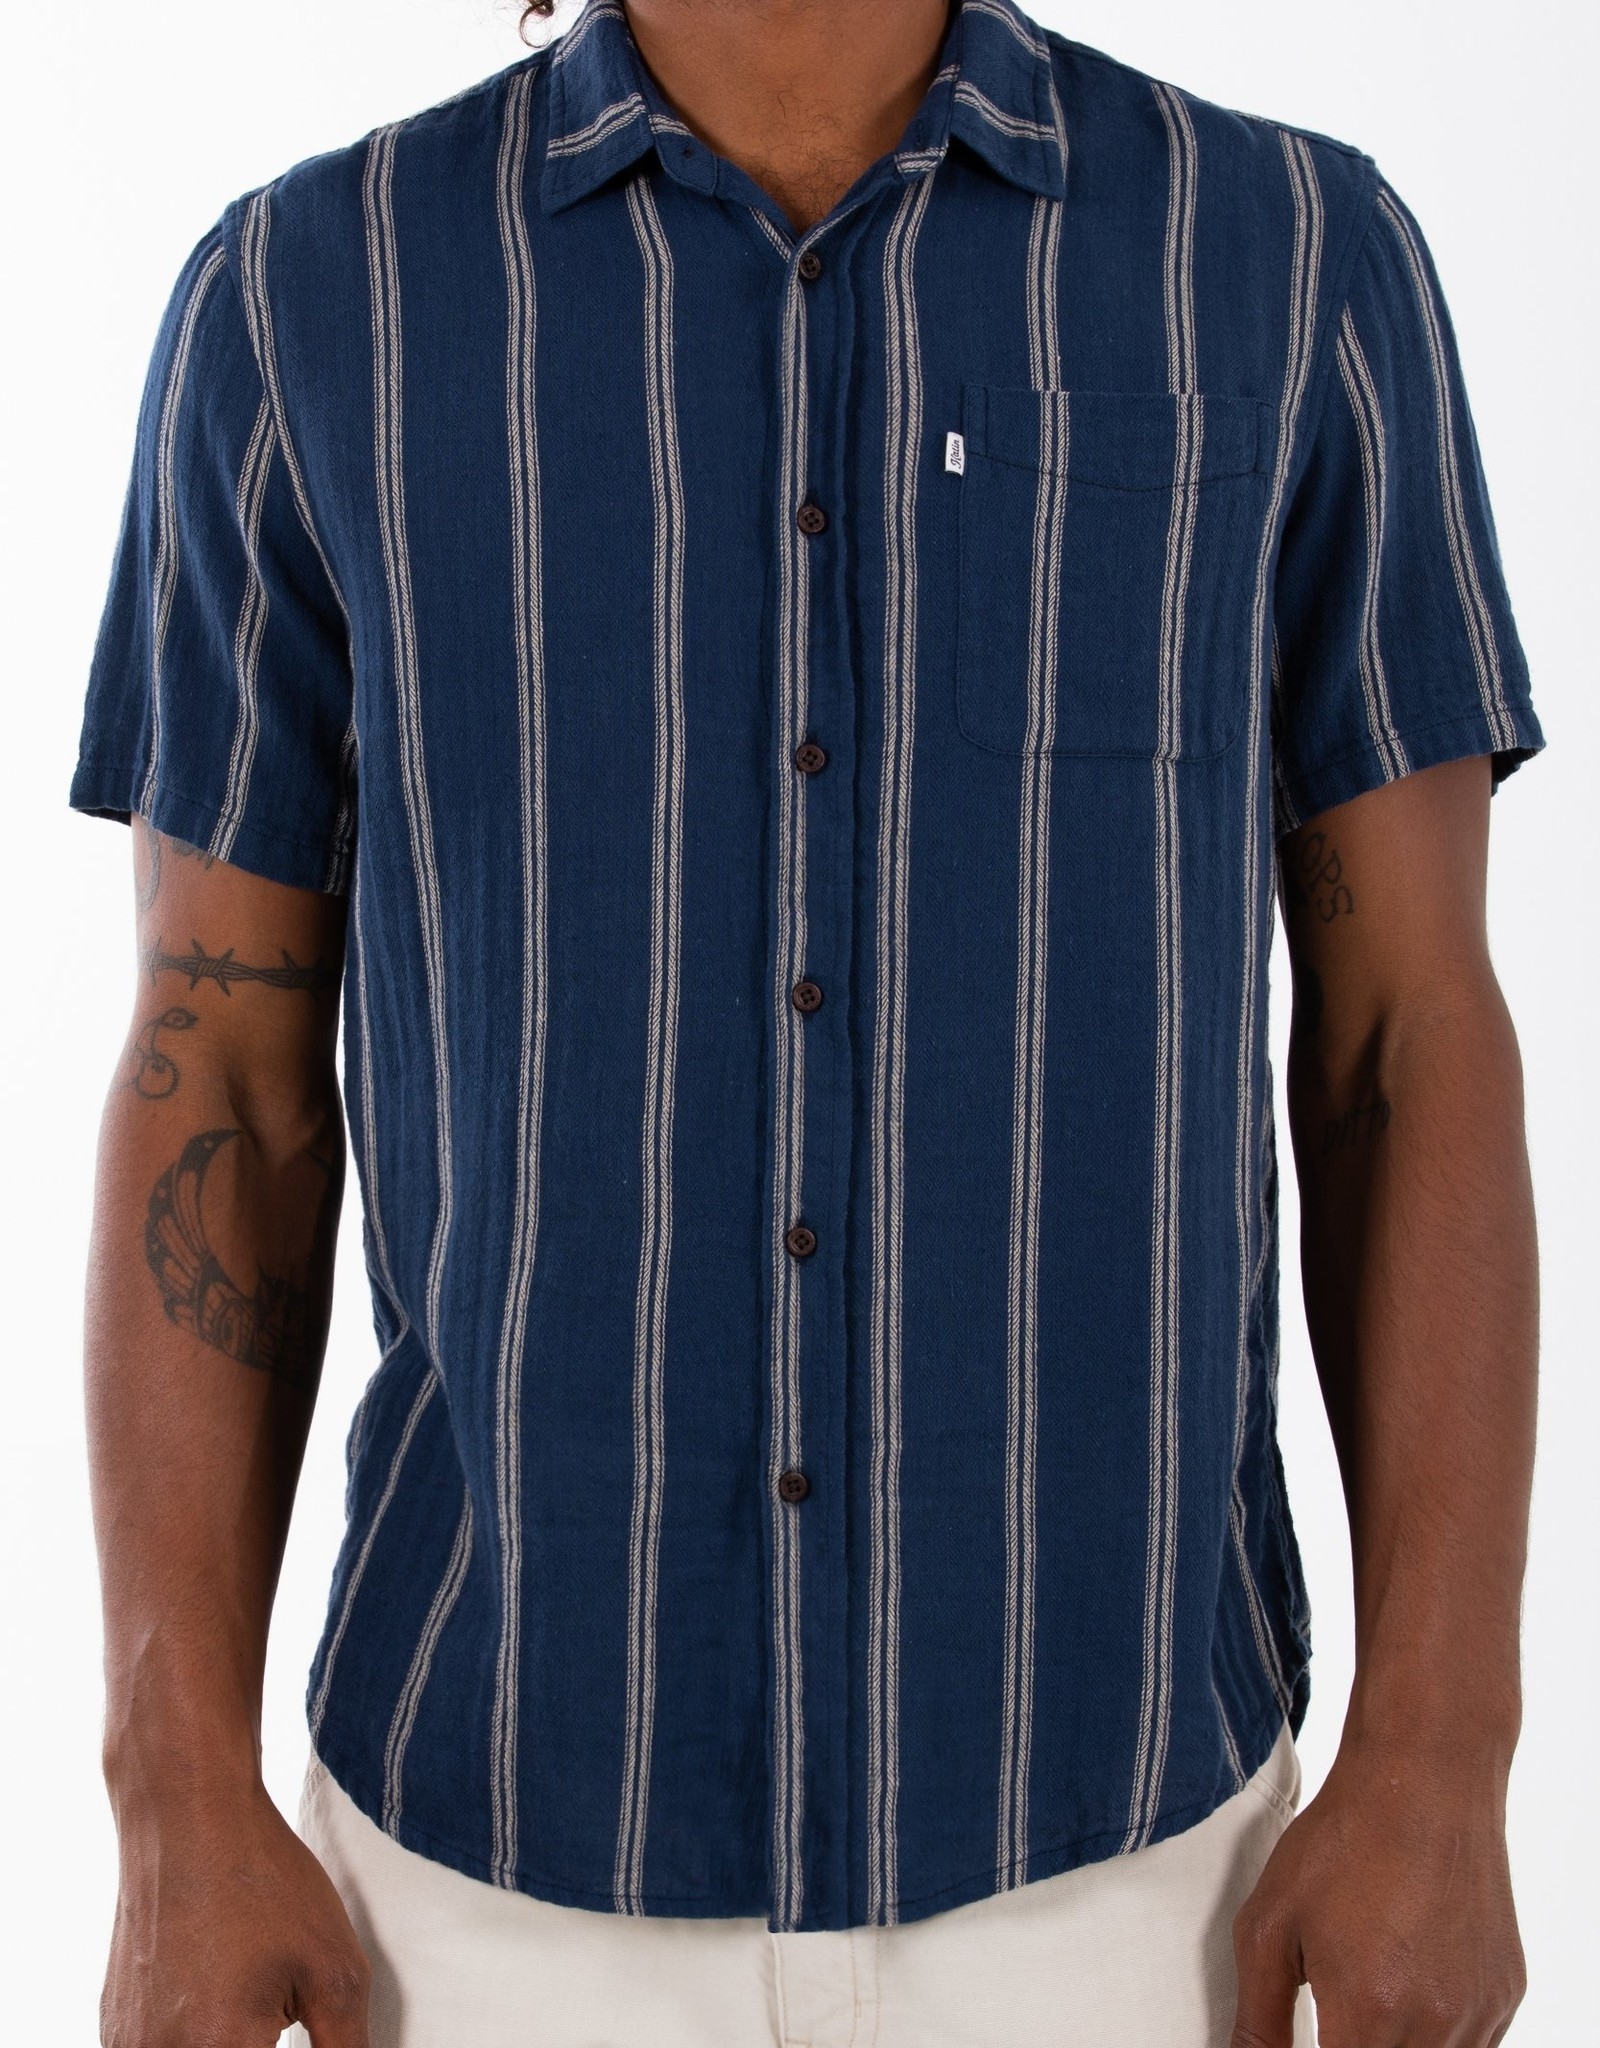 Katin USA Randall Shirt